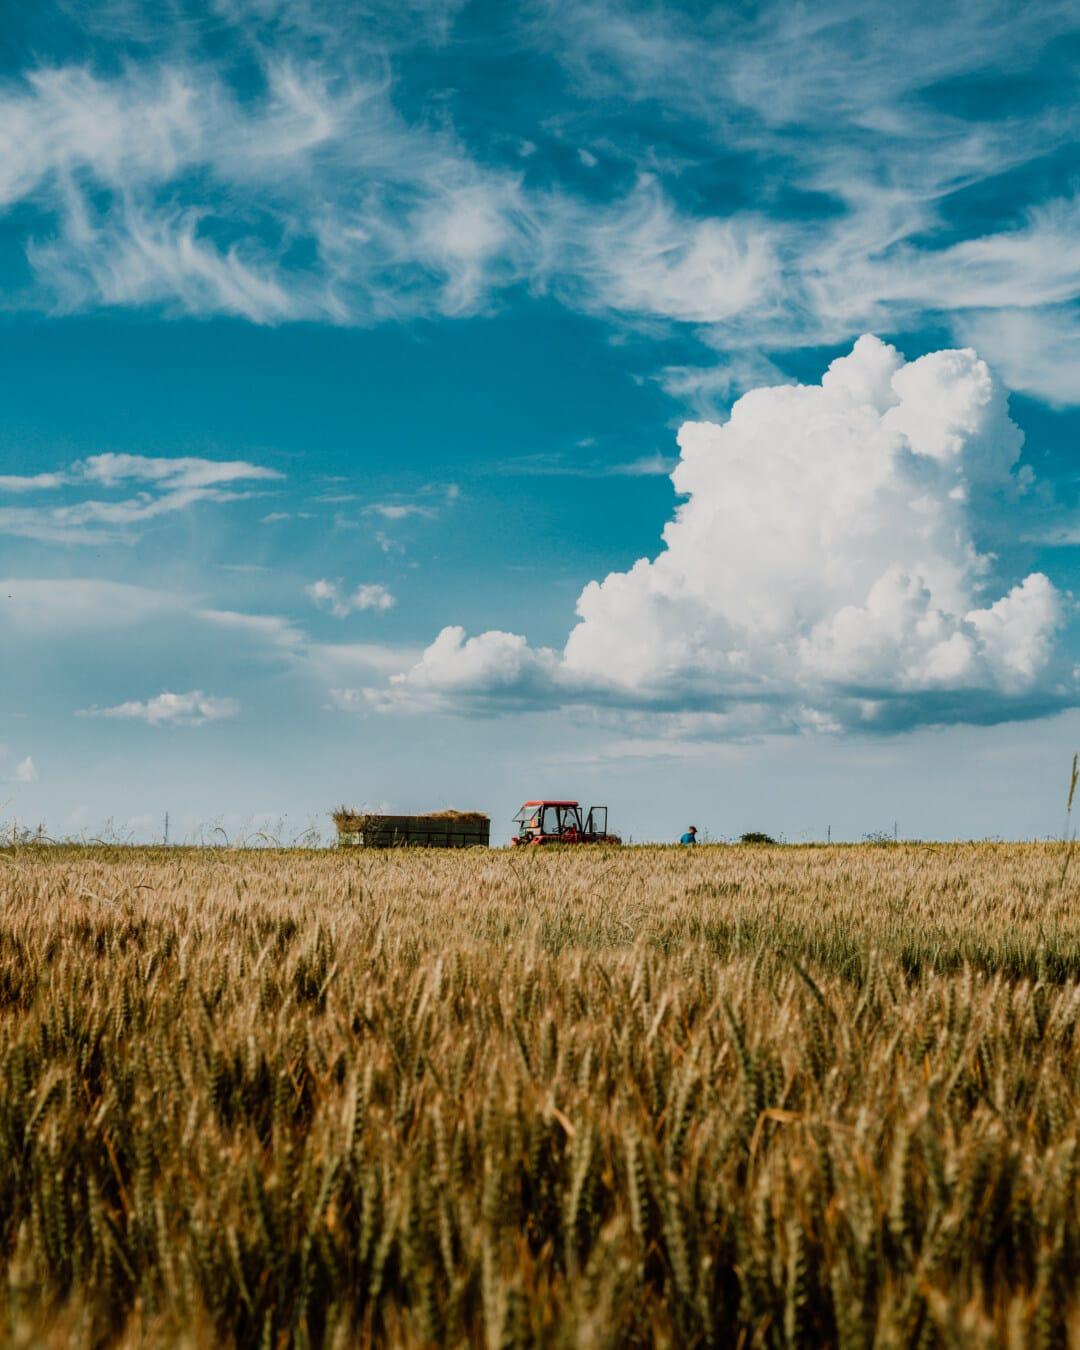 field work, tractor, harvestman, harvester, harvest, wheat, wheatfield, cereal, landscape, field